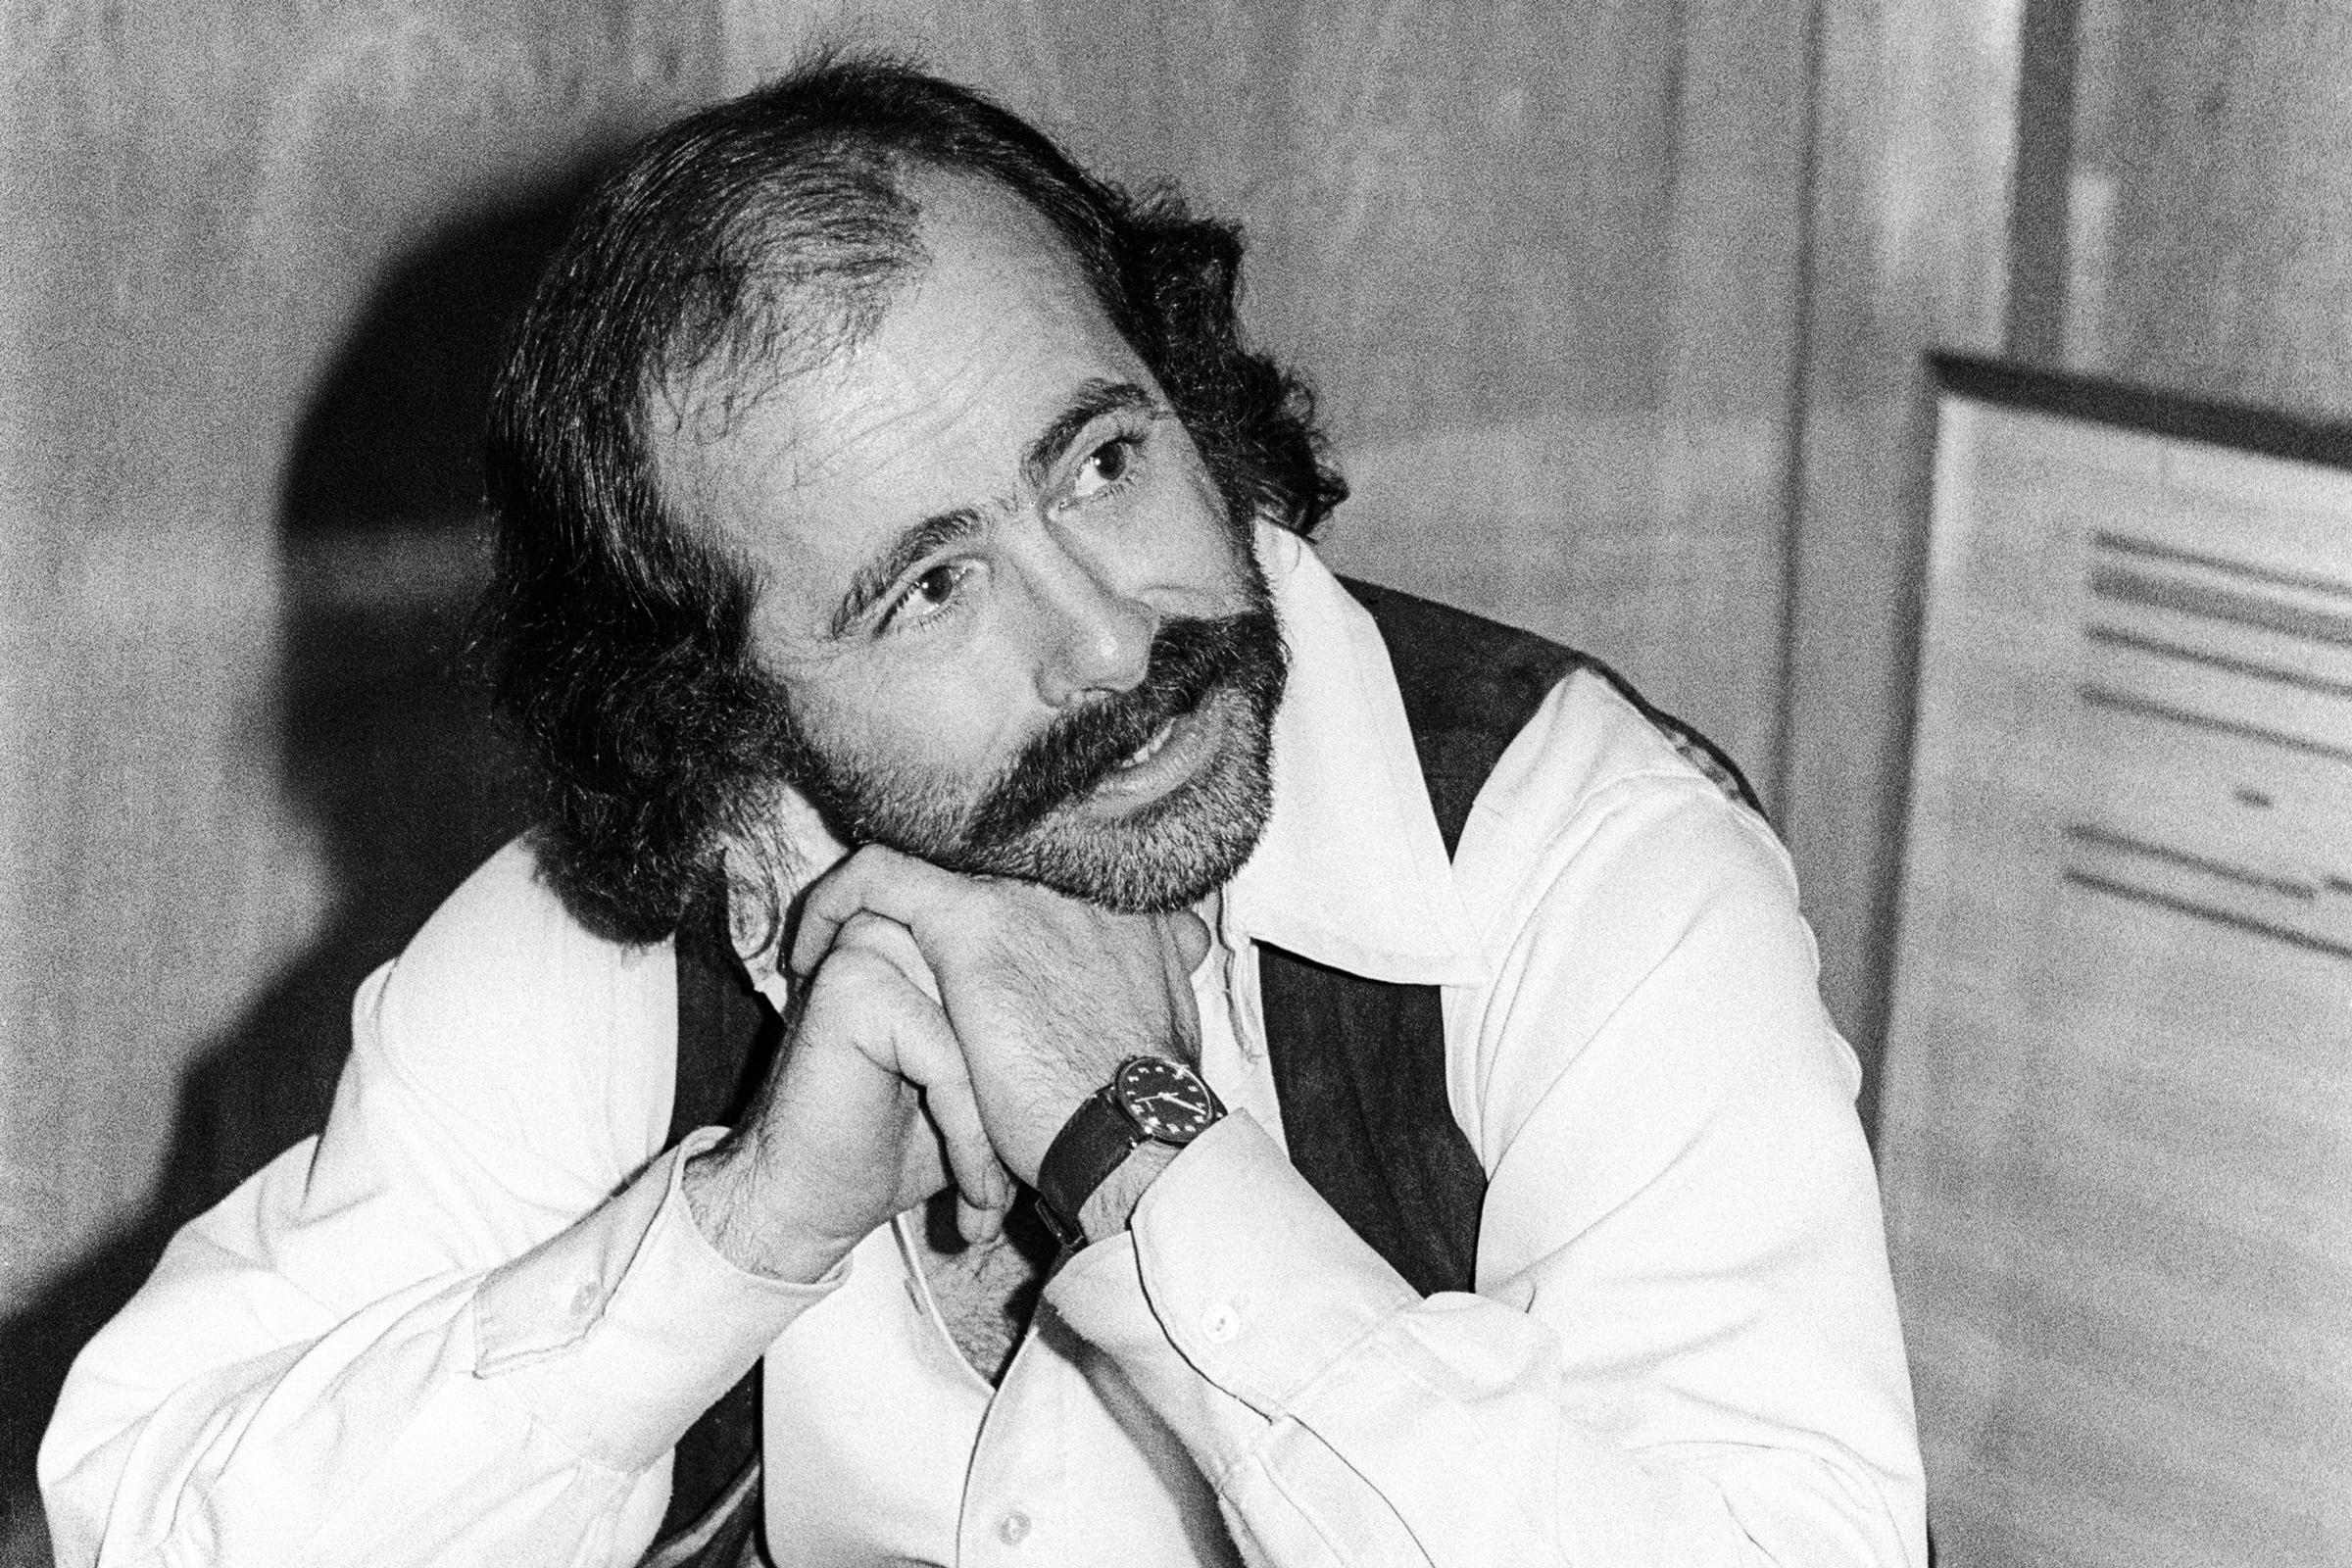 Robert Hunter, Grateful Dead Collaborator and Lyricist, Dead at 78